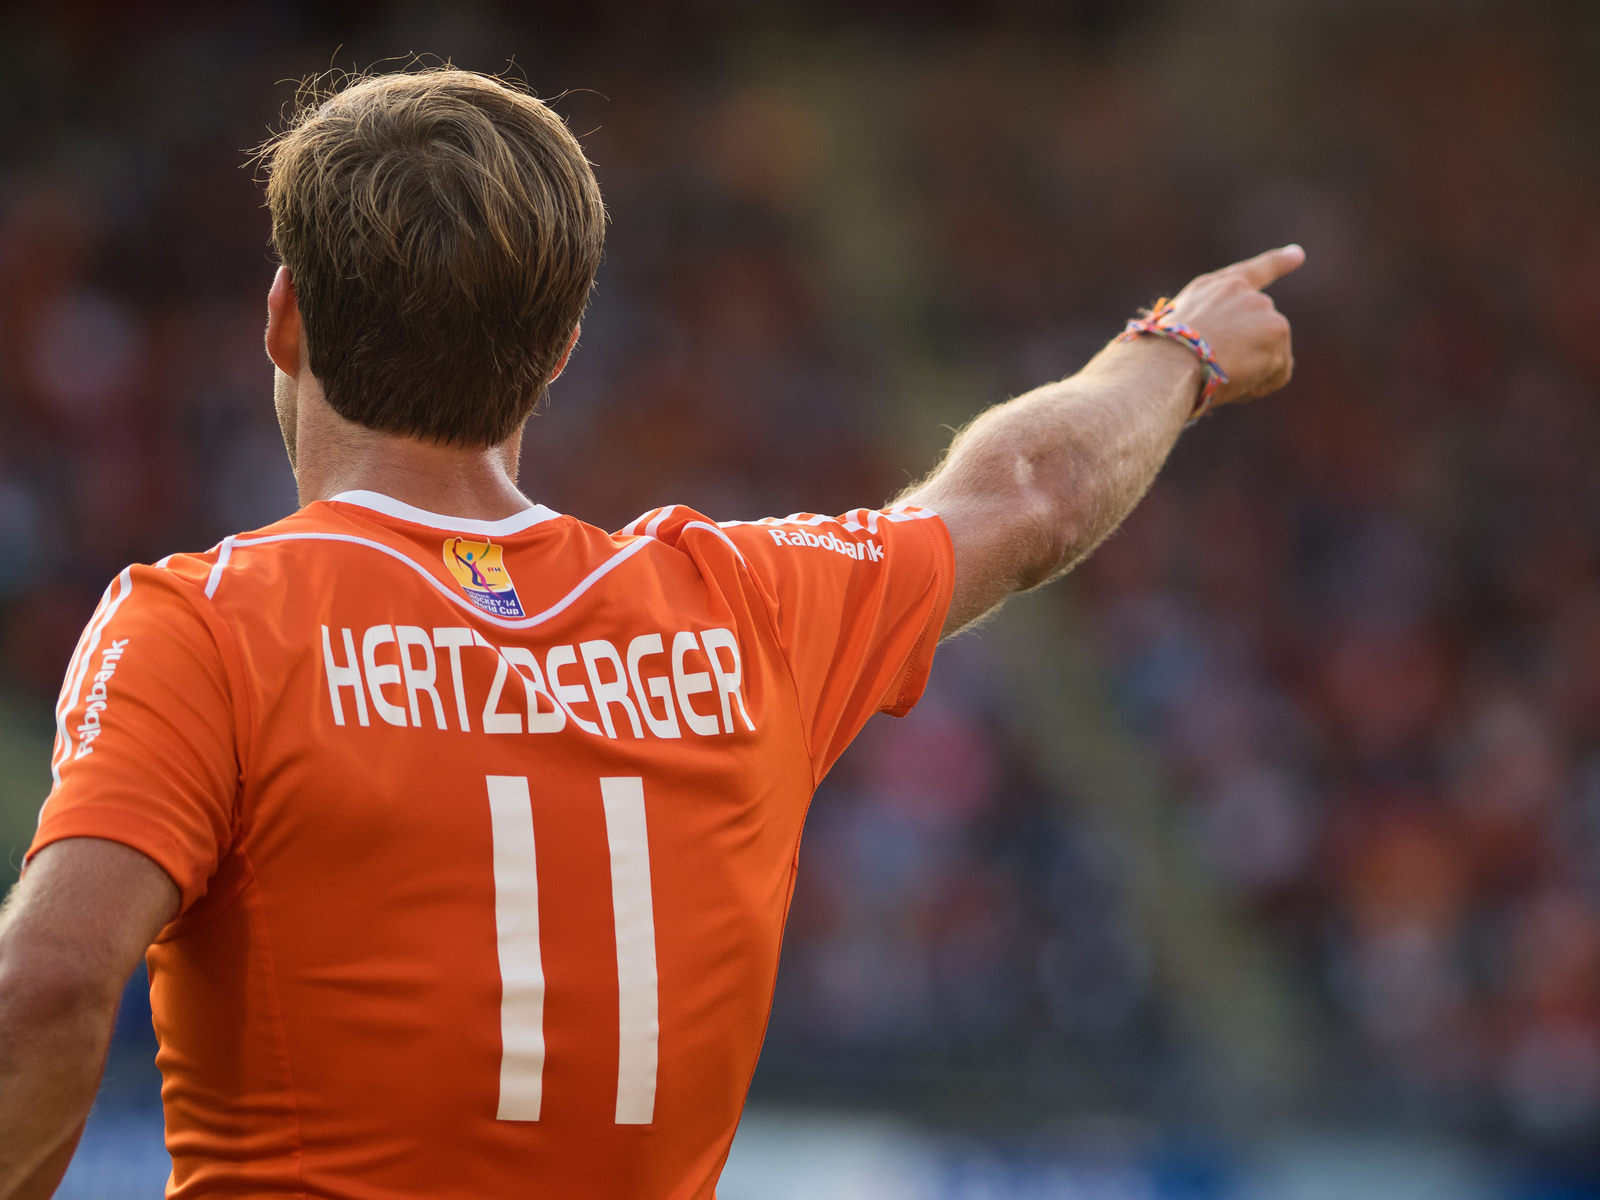 Jeroen Hertzberger terug in trainingsgroep Oranjeheren